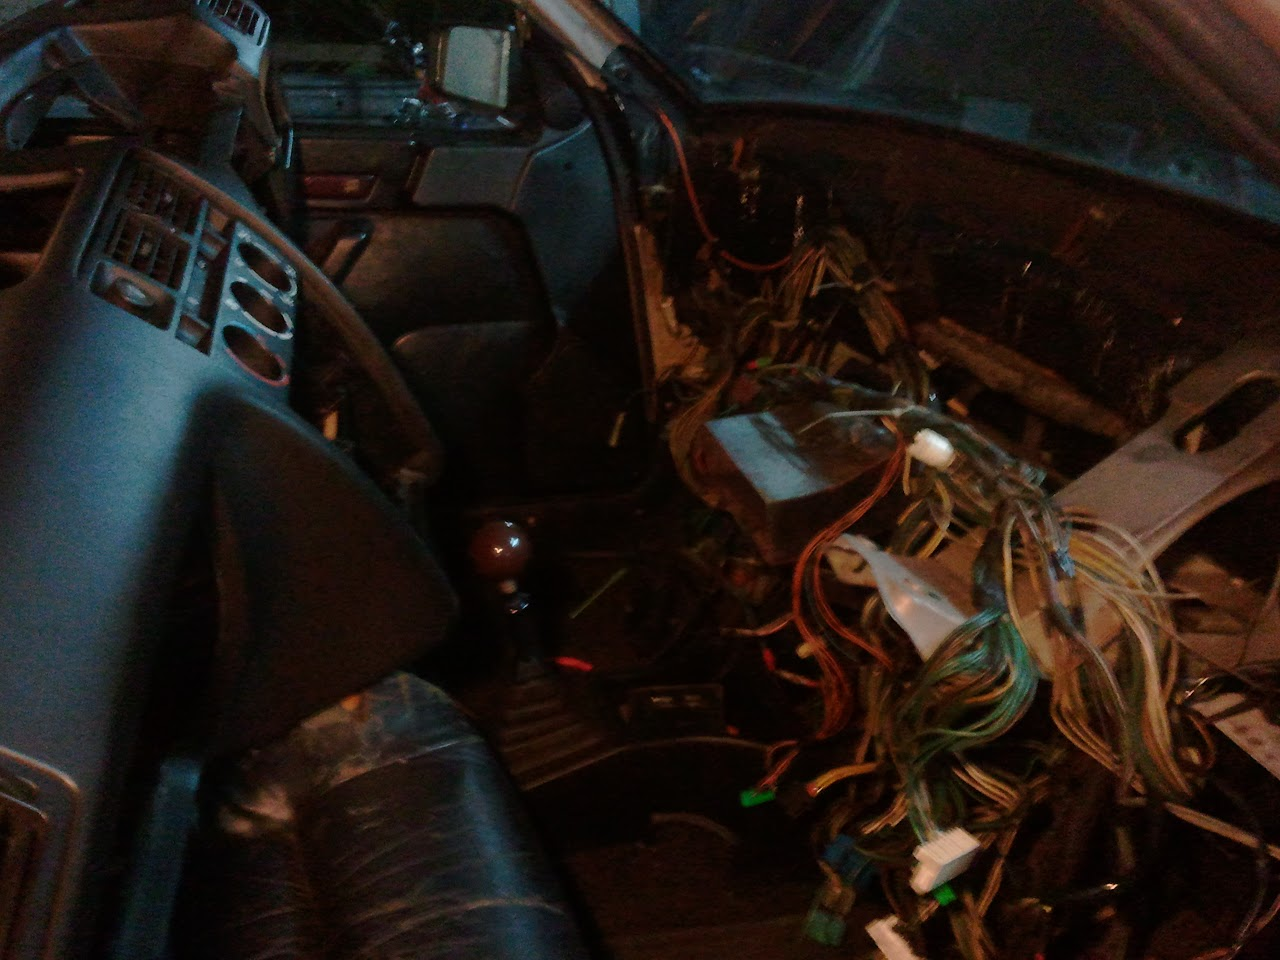 Bx Car Alternator Wiring Diagram Http Clubsmartcarcom Lofiversion